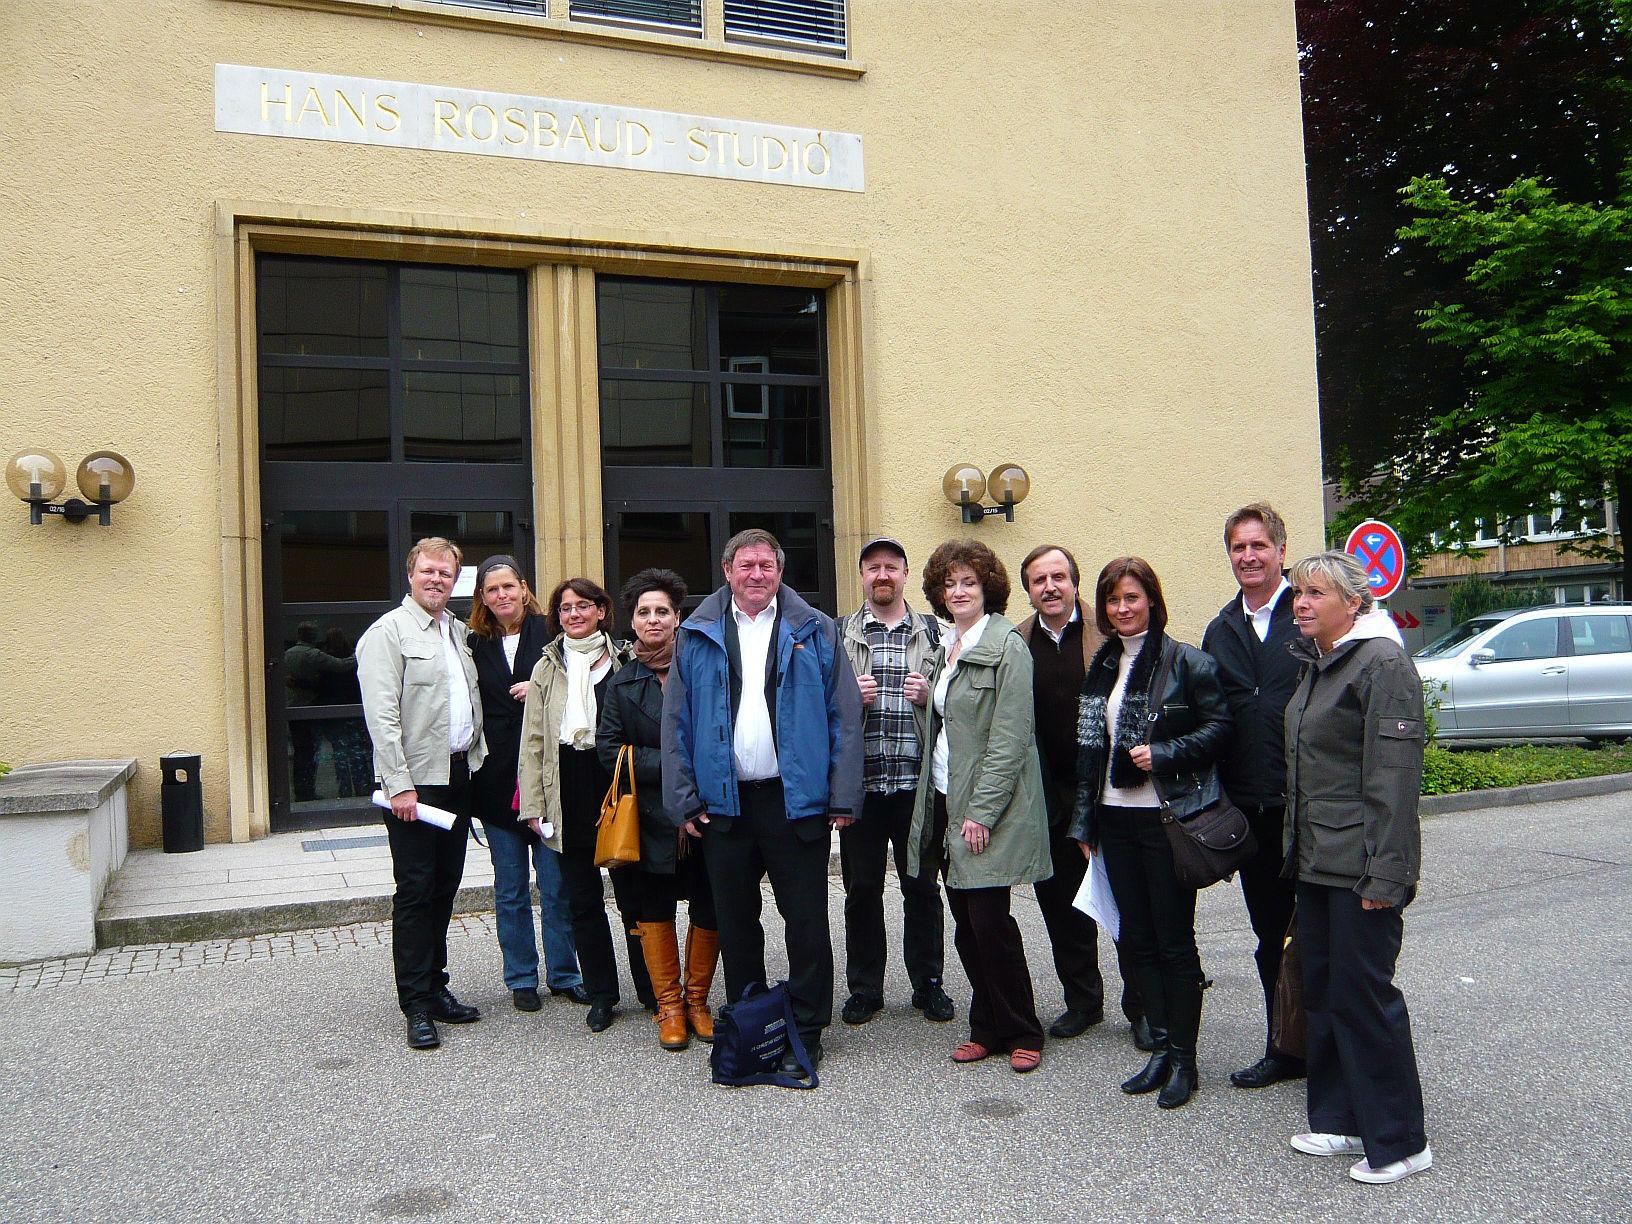 ChorteilnehmervordemRosbaudstudioBaden-Baden